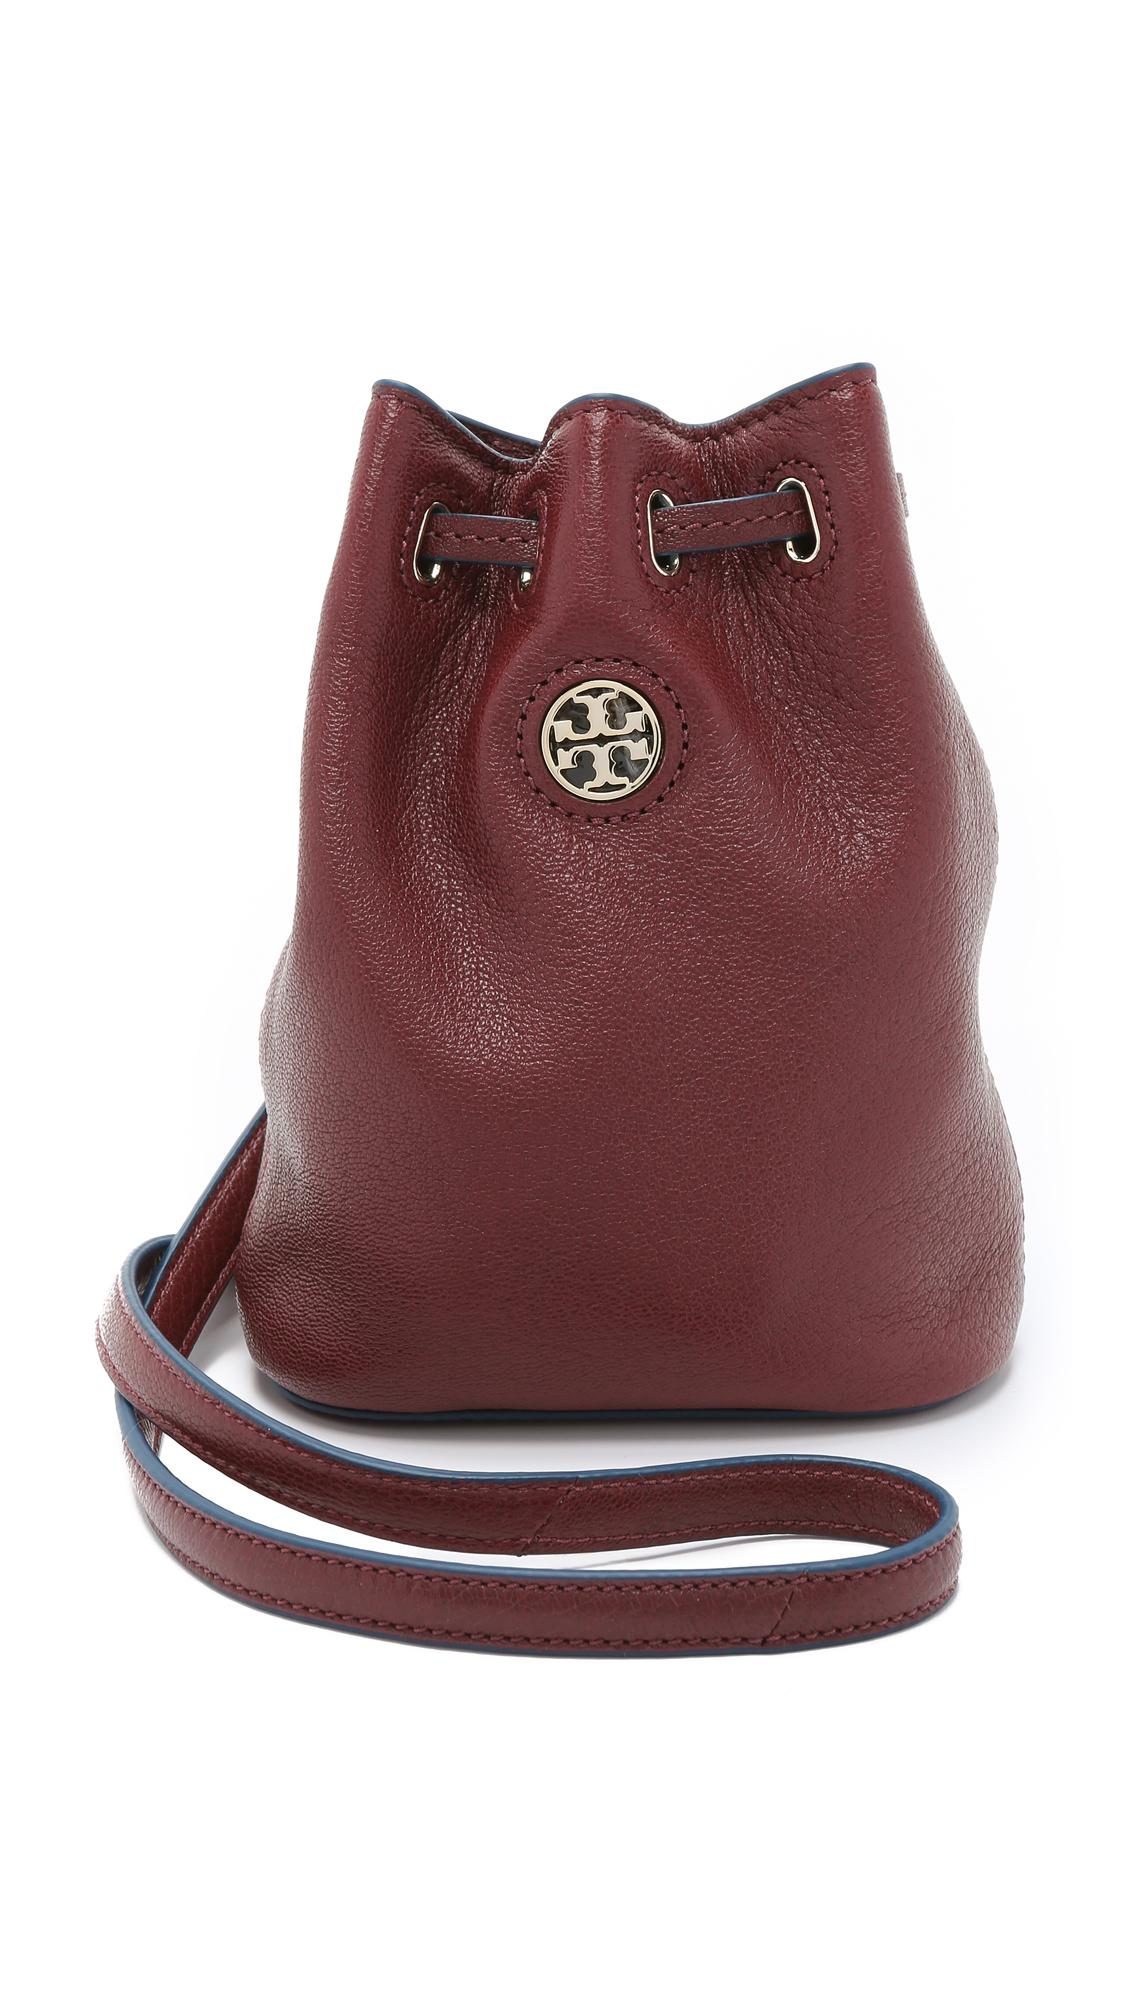 Tory Burch Brody Mini Bucket Bag Deep Berry In Red Deep